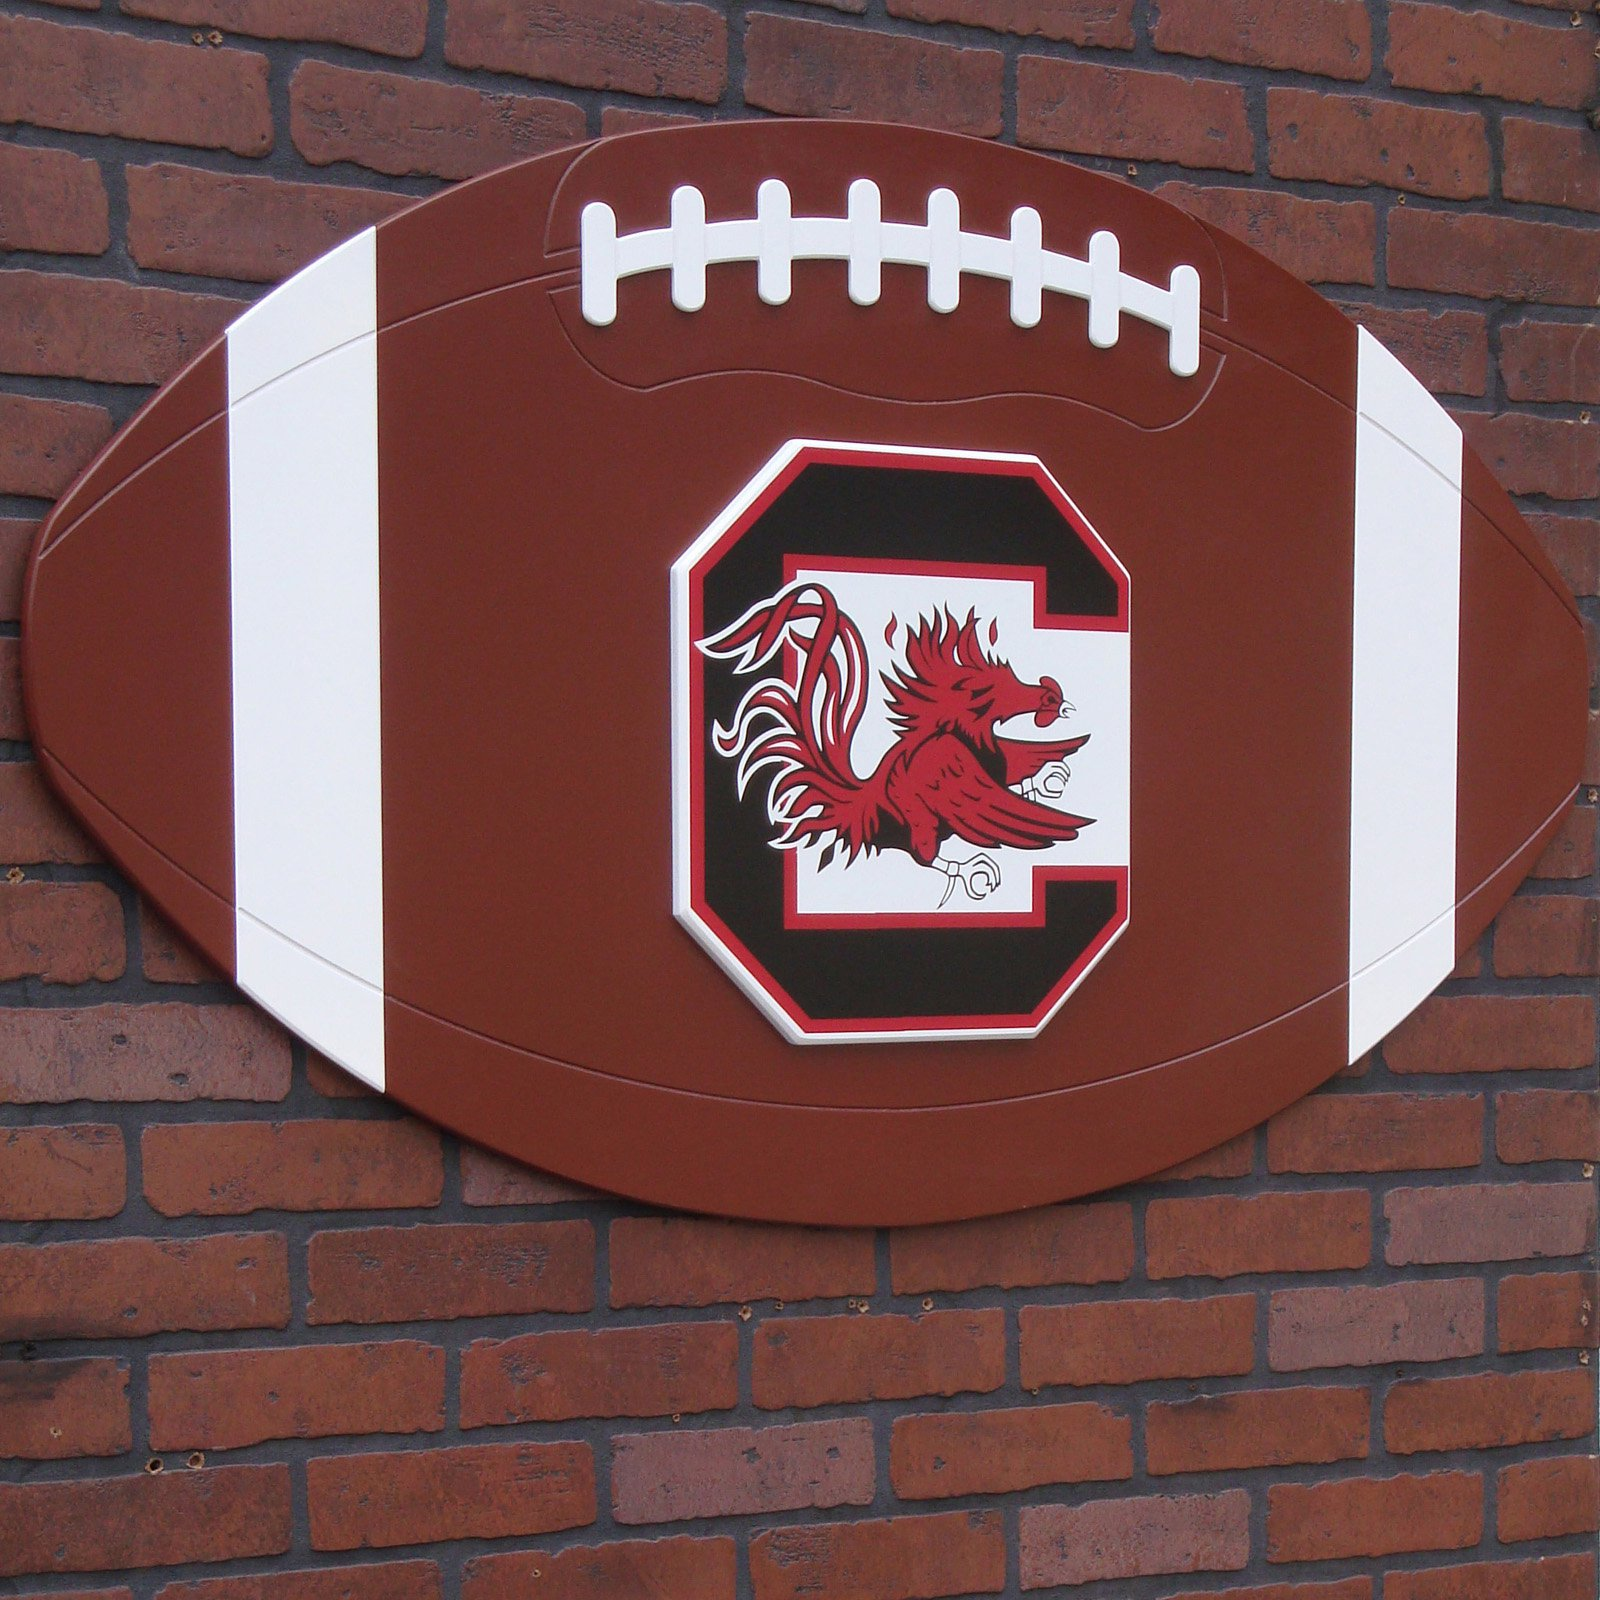 Fan Creations Collegiate Football Wall Art